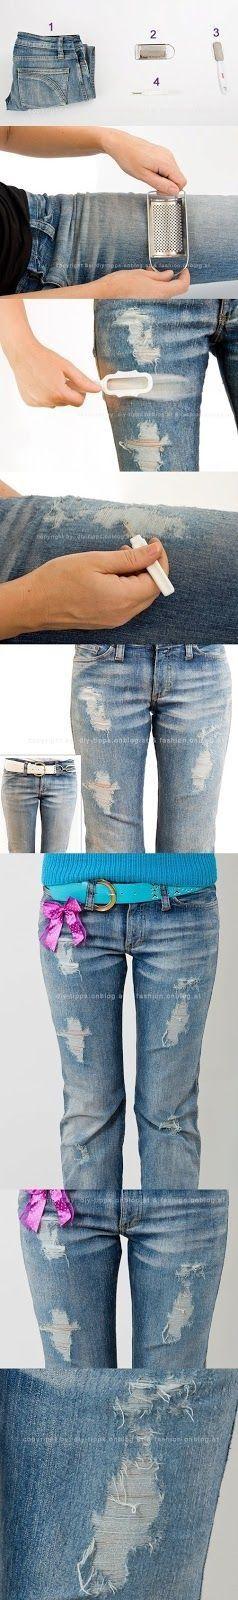 costumizar-jeans